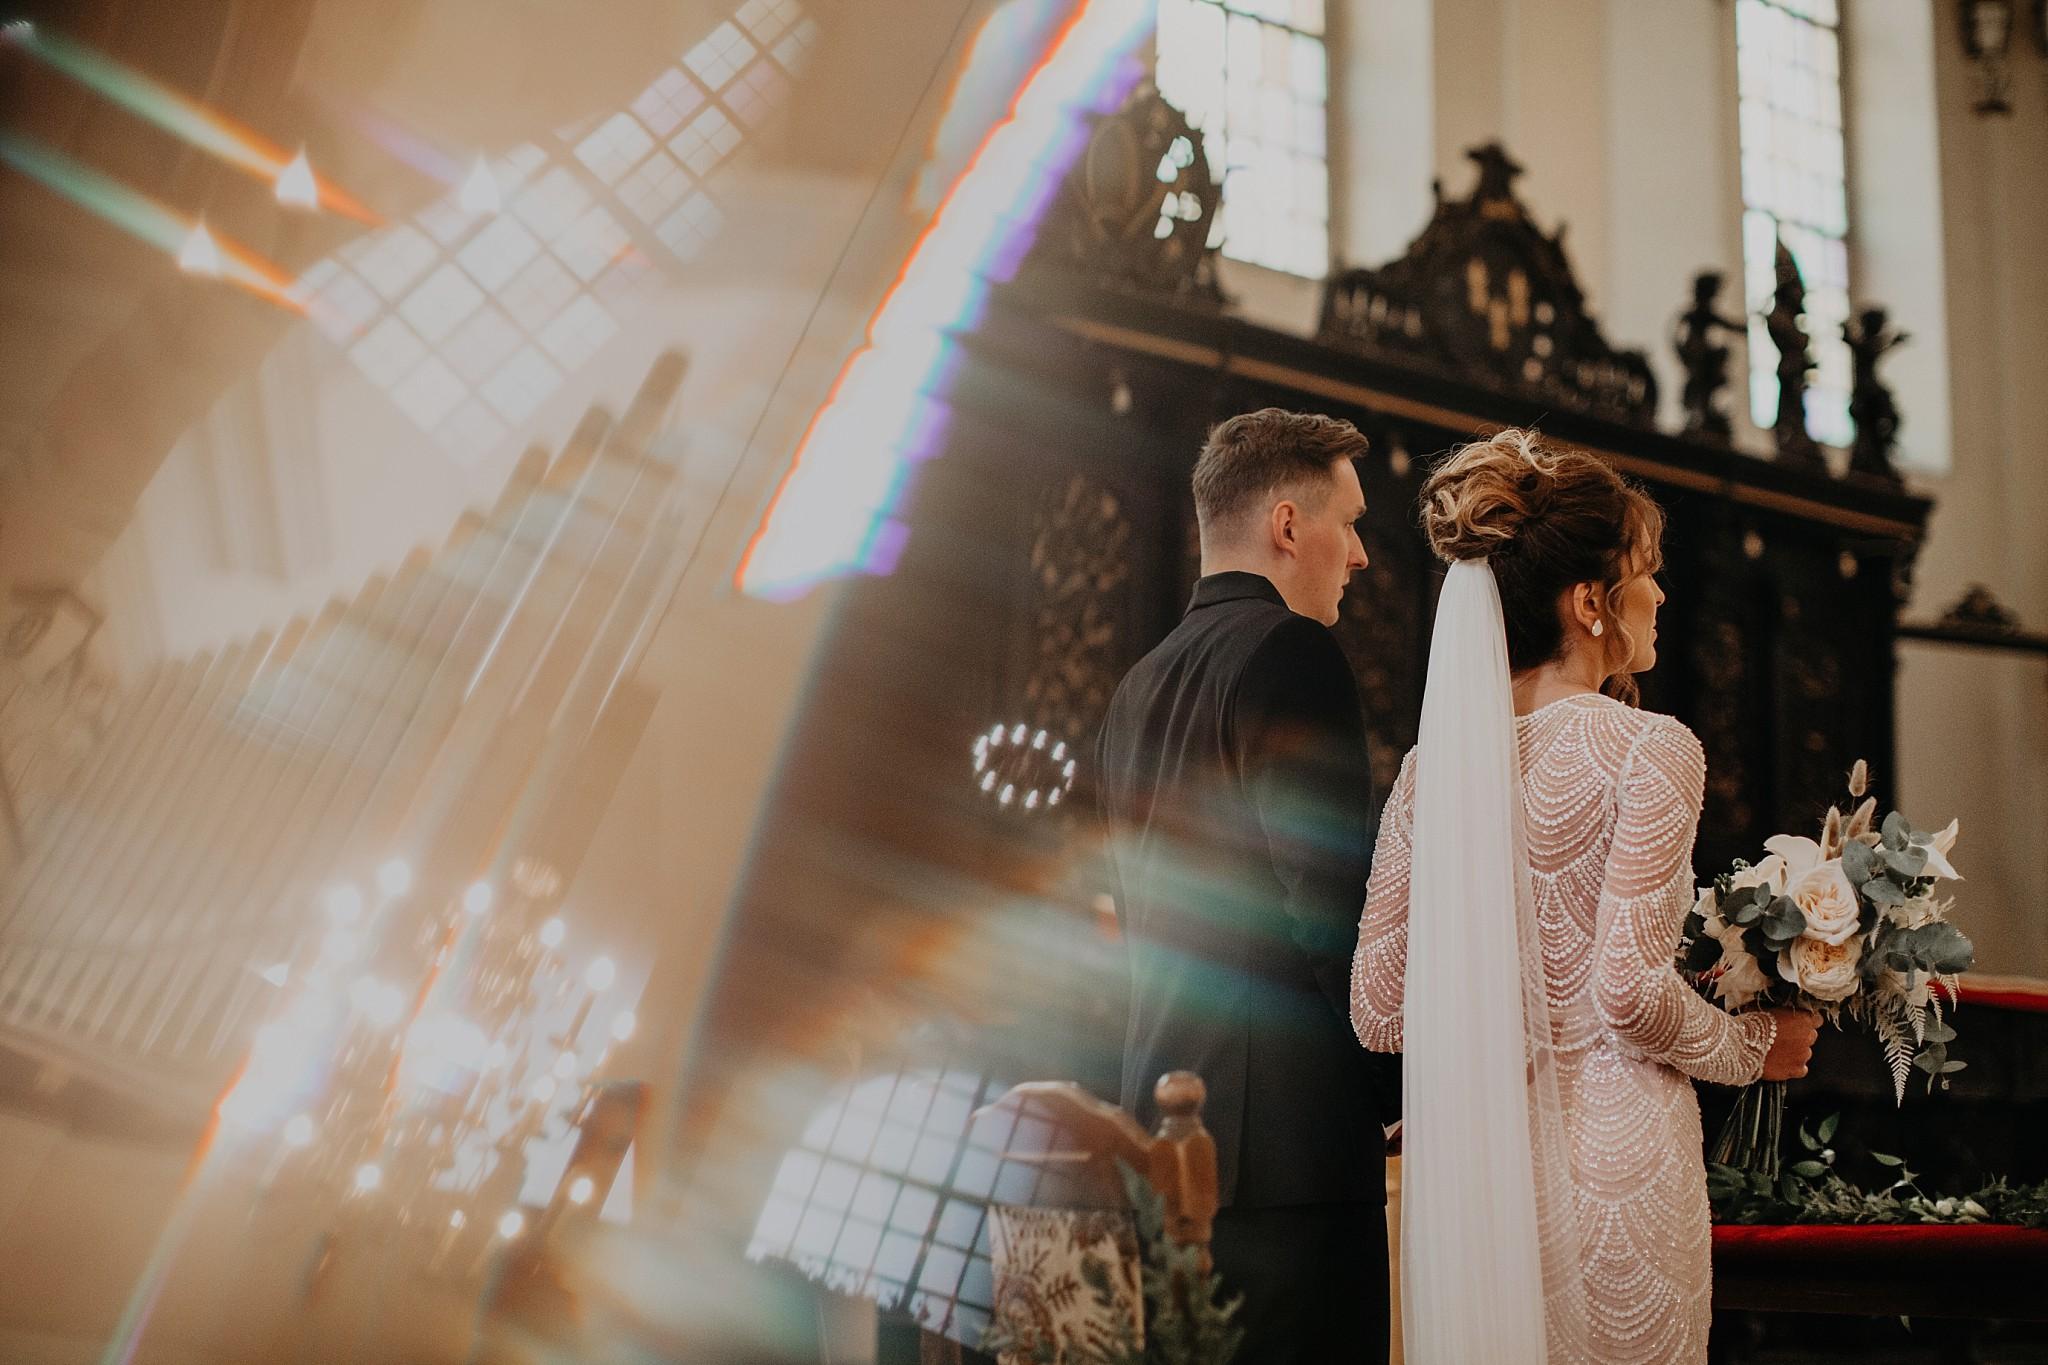 fotograf poznan wesele dobra truskawka piekne wesele pod poznaniem wesele w dobrej truskawce piekna para mloda slub marzen slub koronawirus slub listopad wesele koronawirus 156